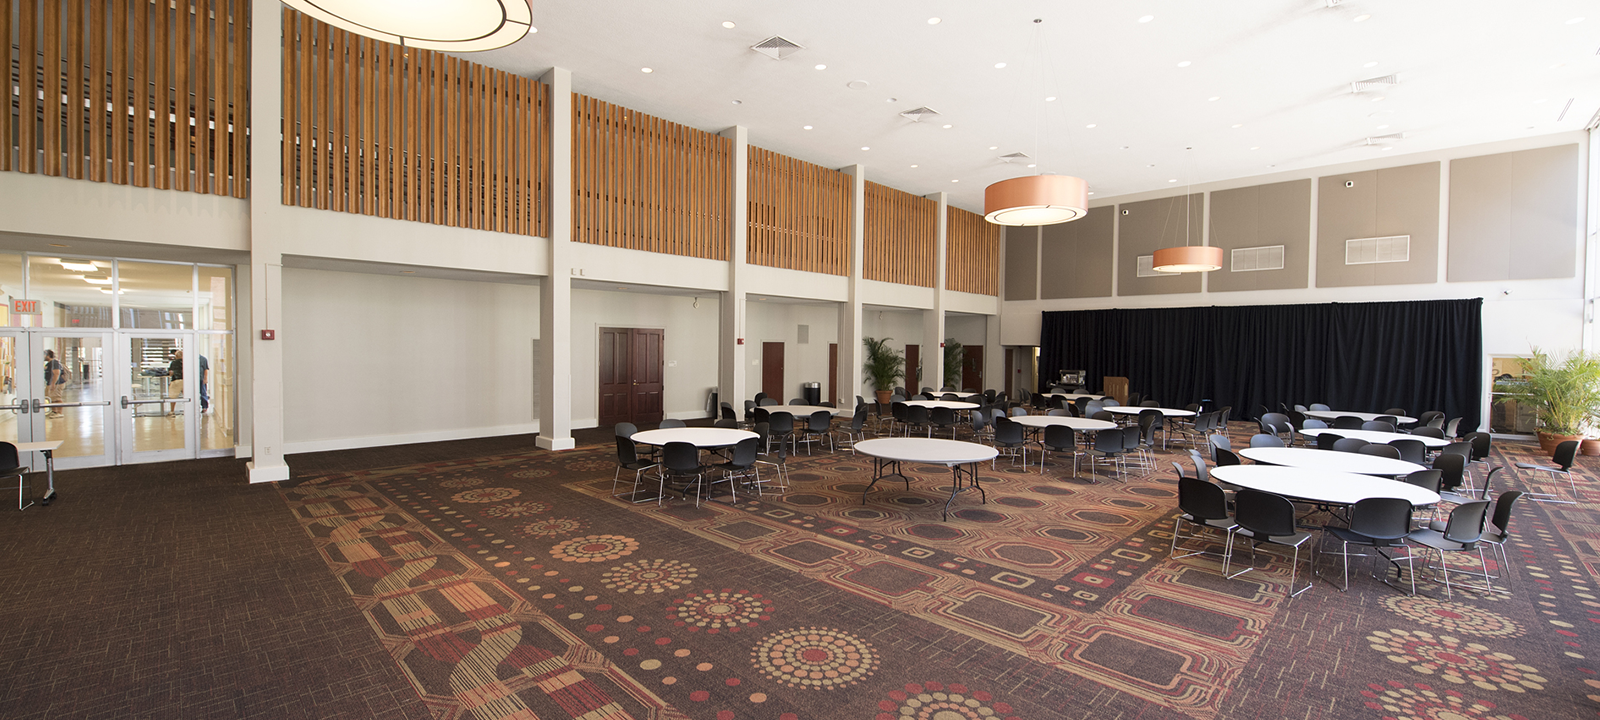 St. Charles Room, Danna Student Center